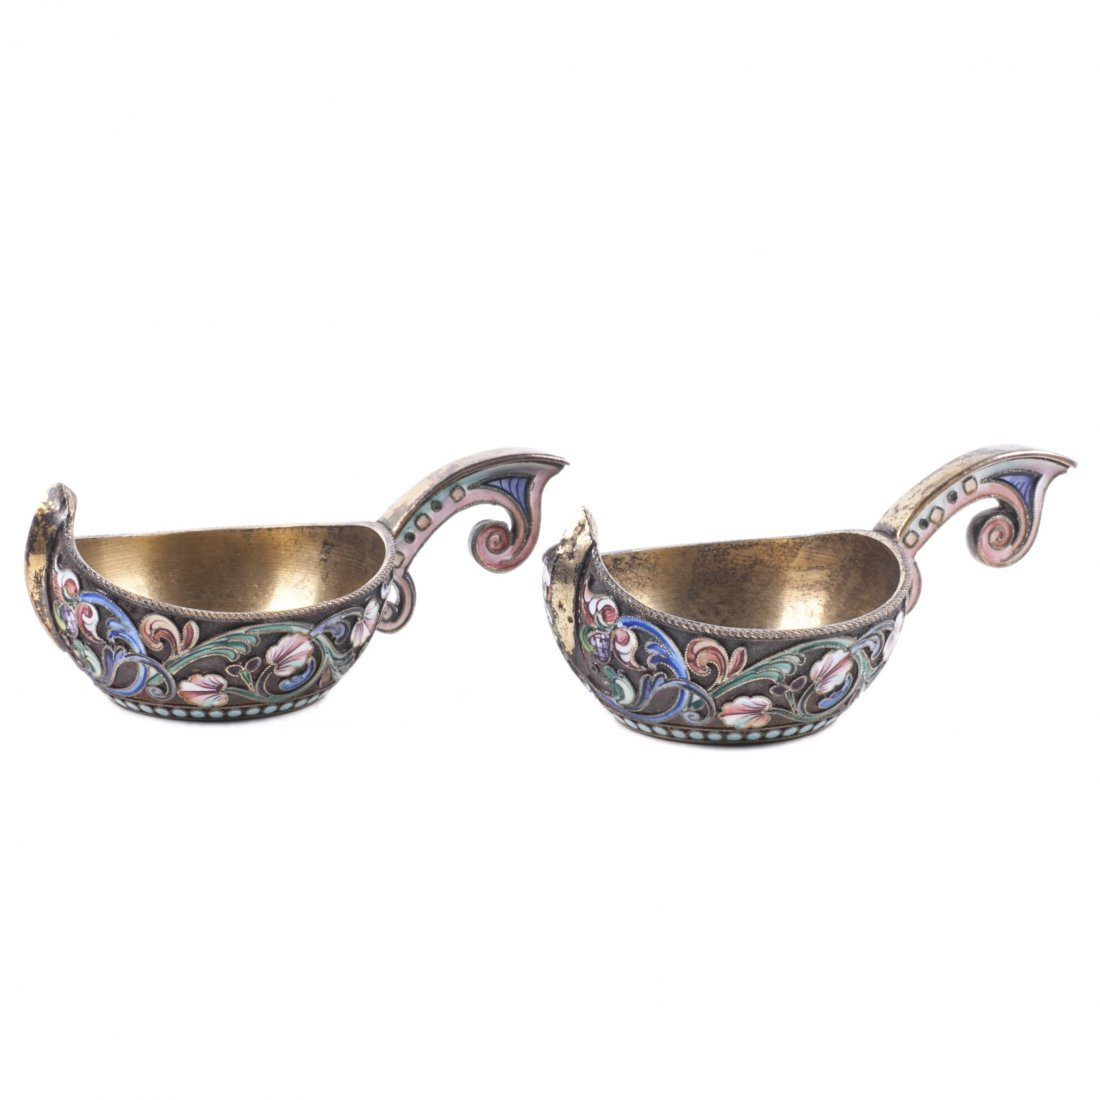 Russian silver enamel pair of kovshs